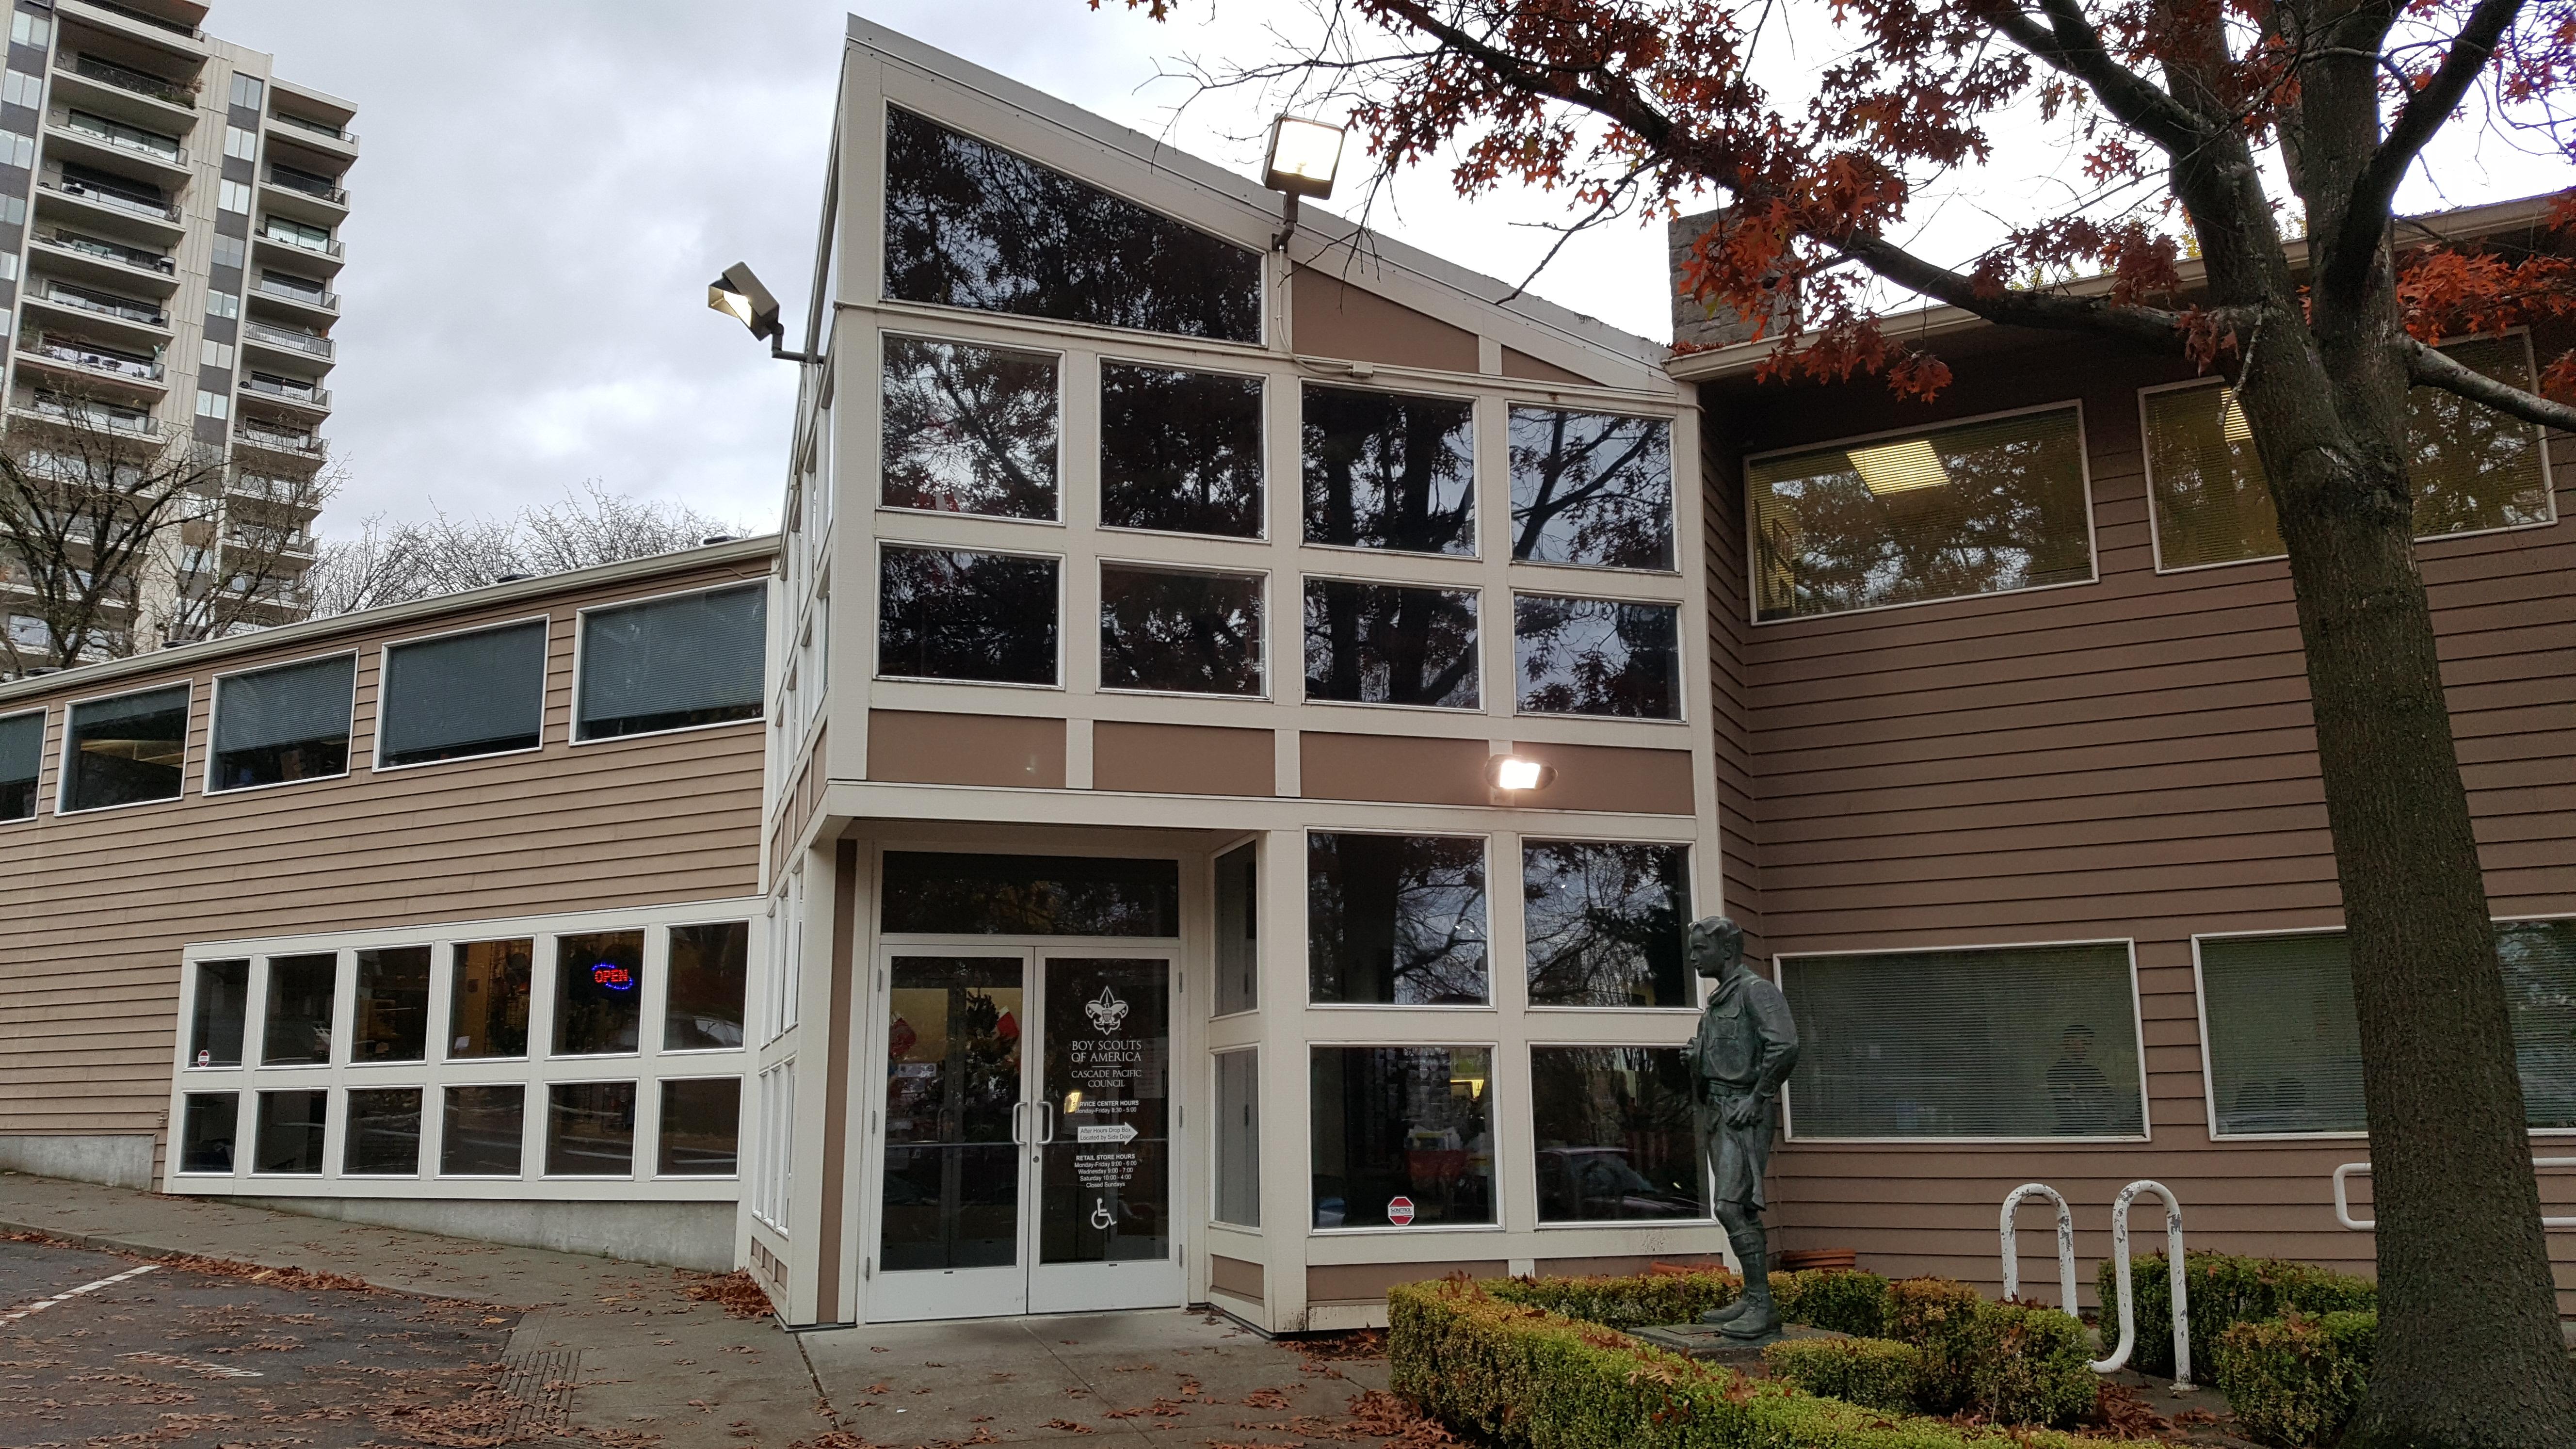 File:BSA, Portland, Oregon, 2018 - 1 jpg - Wikimedia Commons